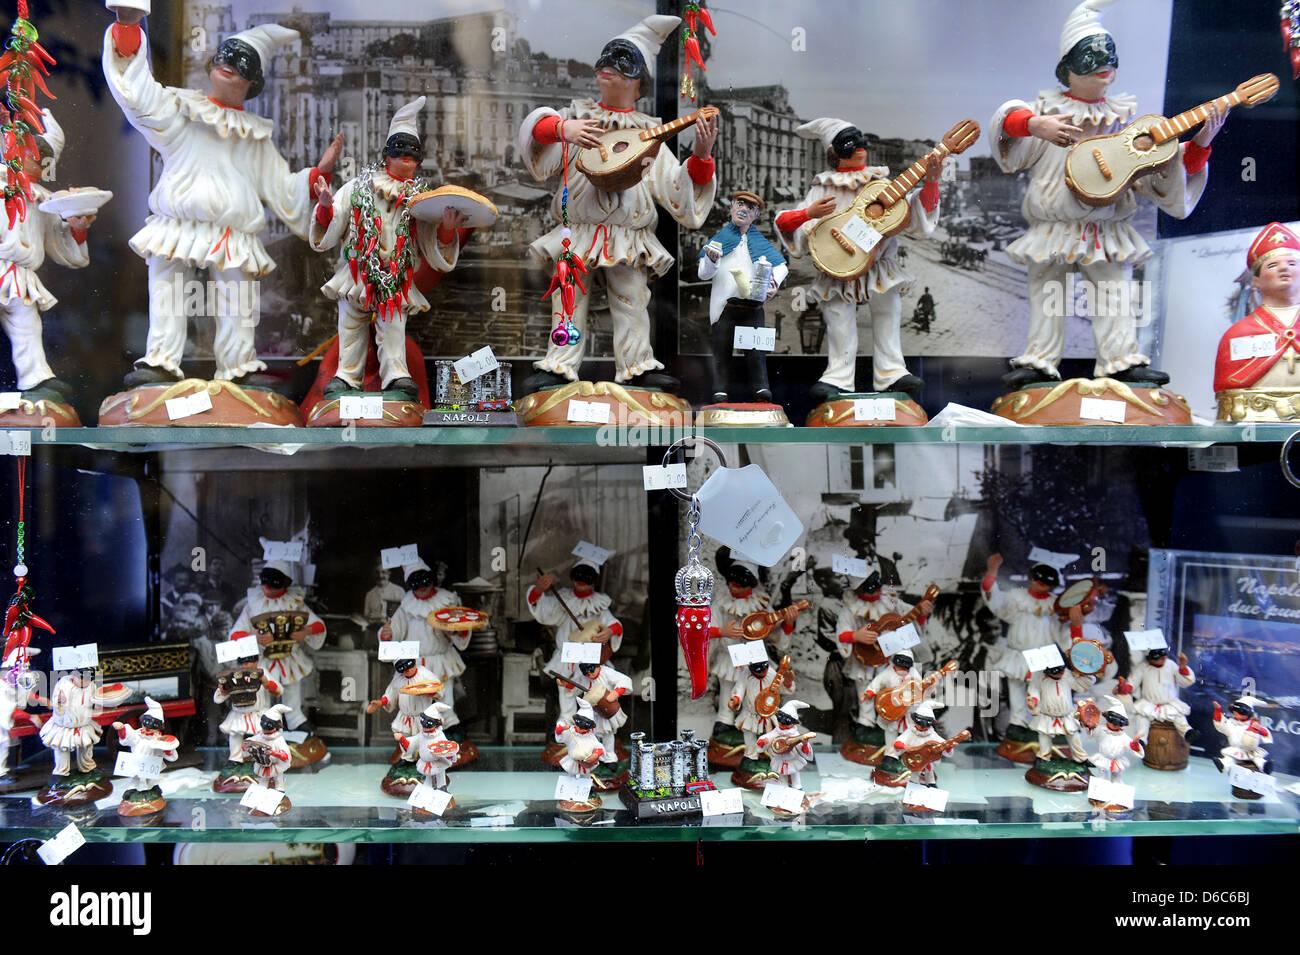 Pulcinella dolls in a shop window display, Naples, Itlay. - Stock Image